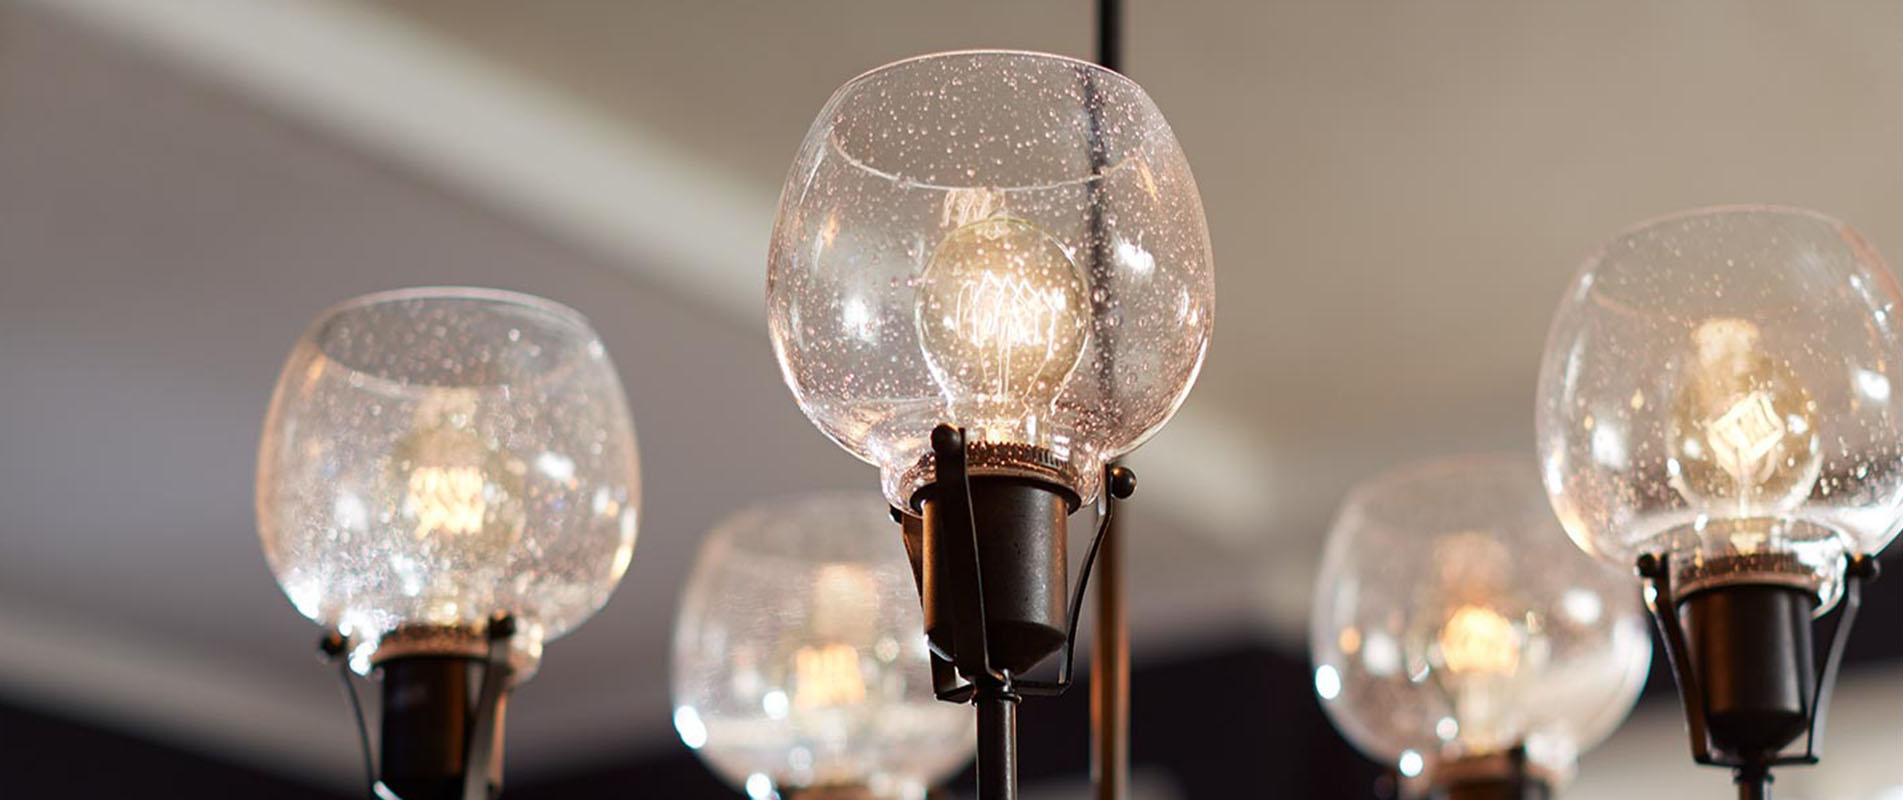 Letu0027s Lighting Impulse expert help you set up your ambiance with highest level of satisfaction & Lighting Impulse azcodes.com